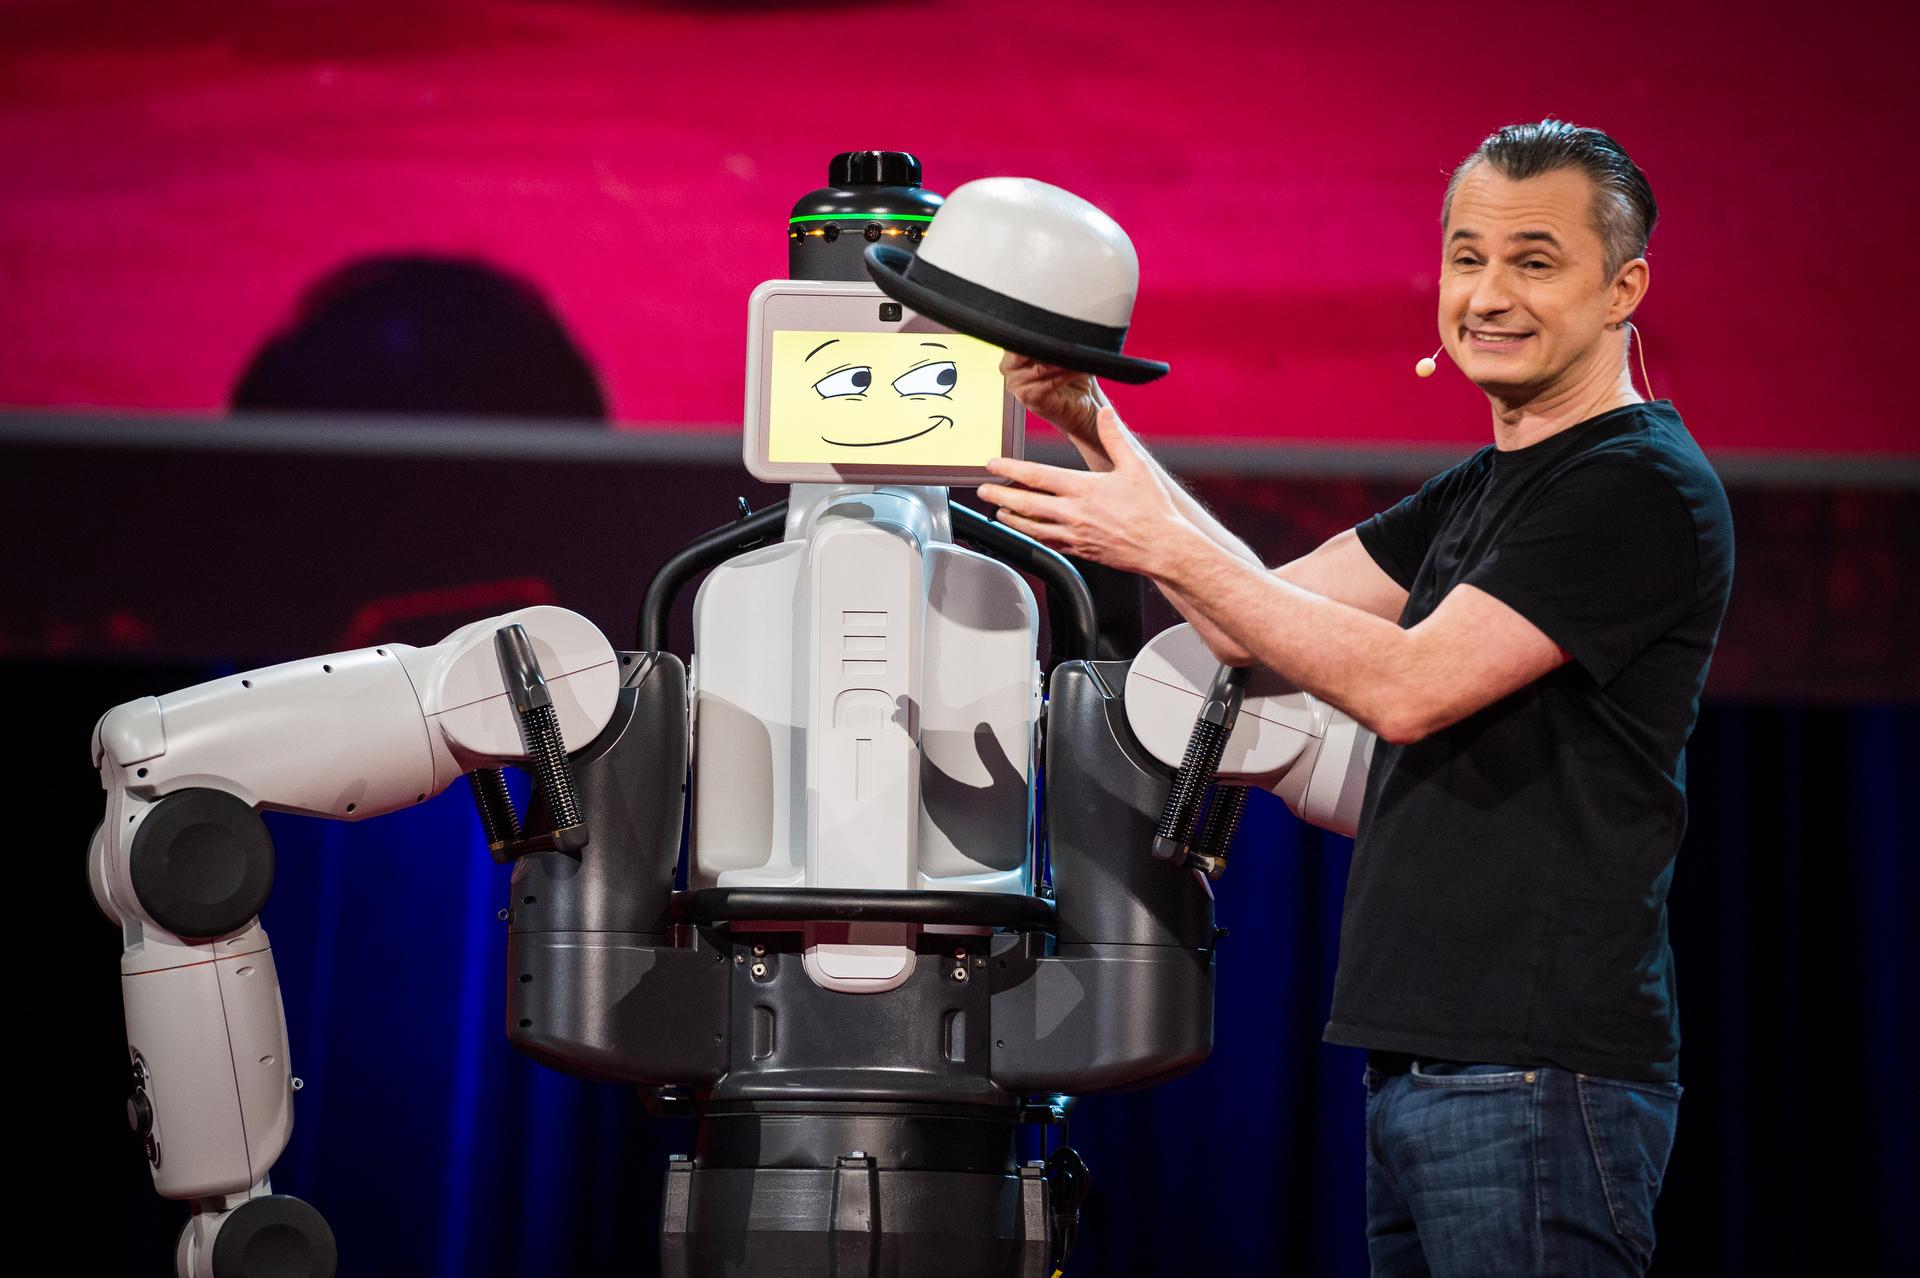 Marco Tempest and EDI the Robot. Photo: James Duncan Davidson